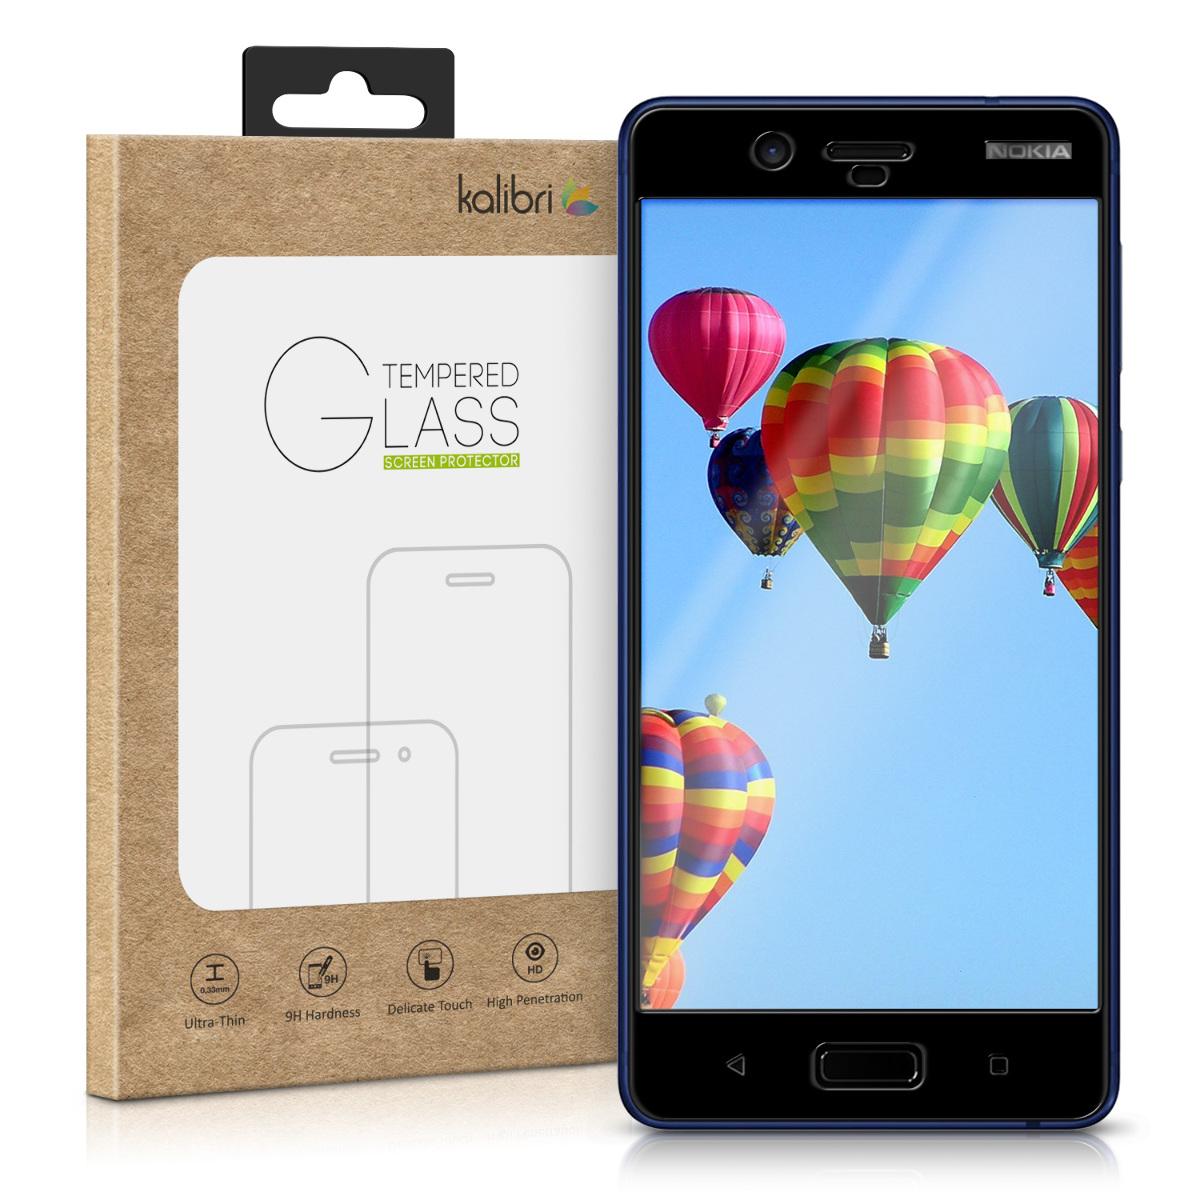 Kalibri Tempered Glass - Fullface Αντιχαρακτικό Γυαλί Οθόνης Nokia 8 - Black Frame (42972.01)